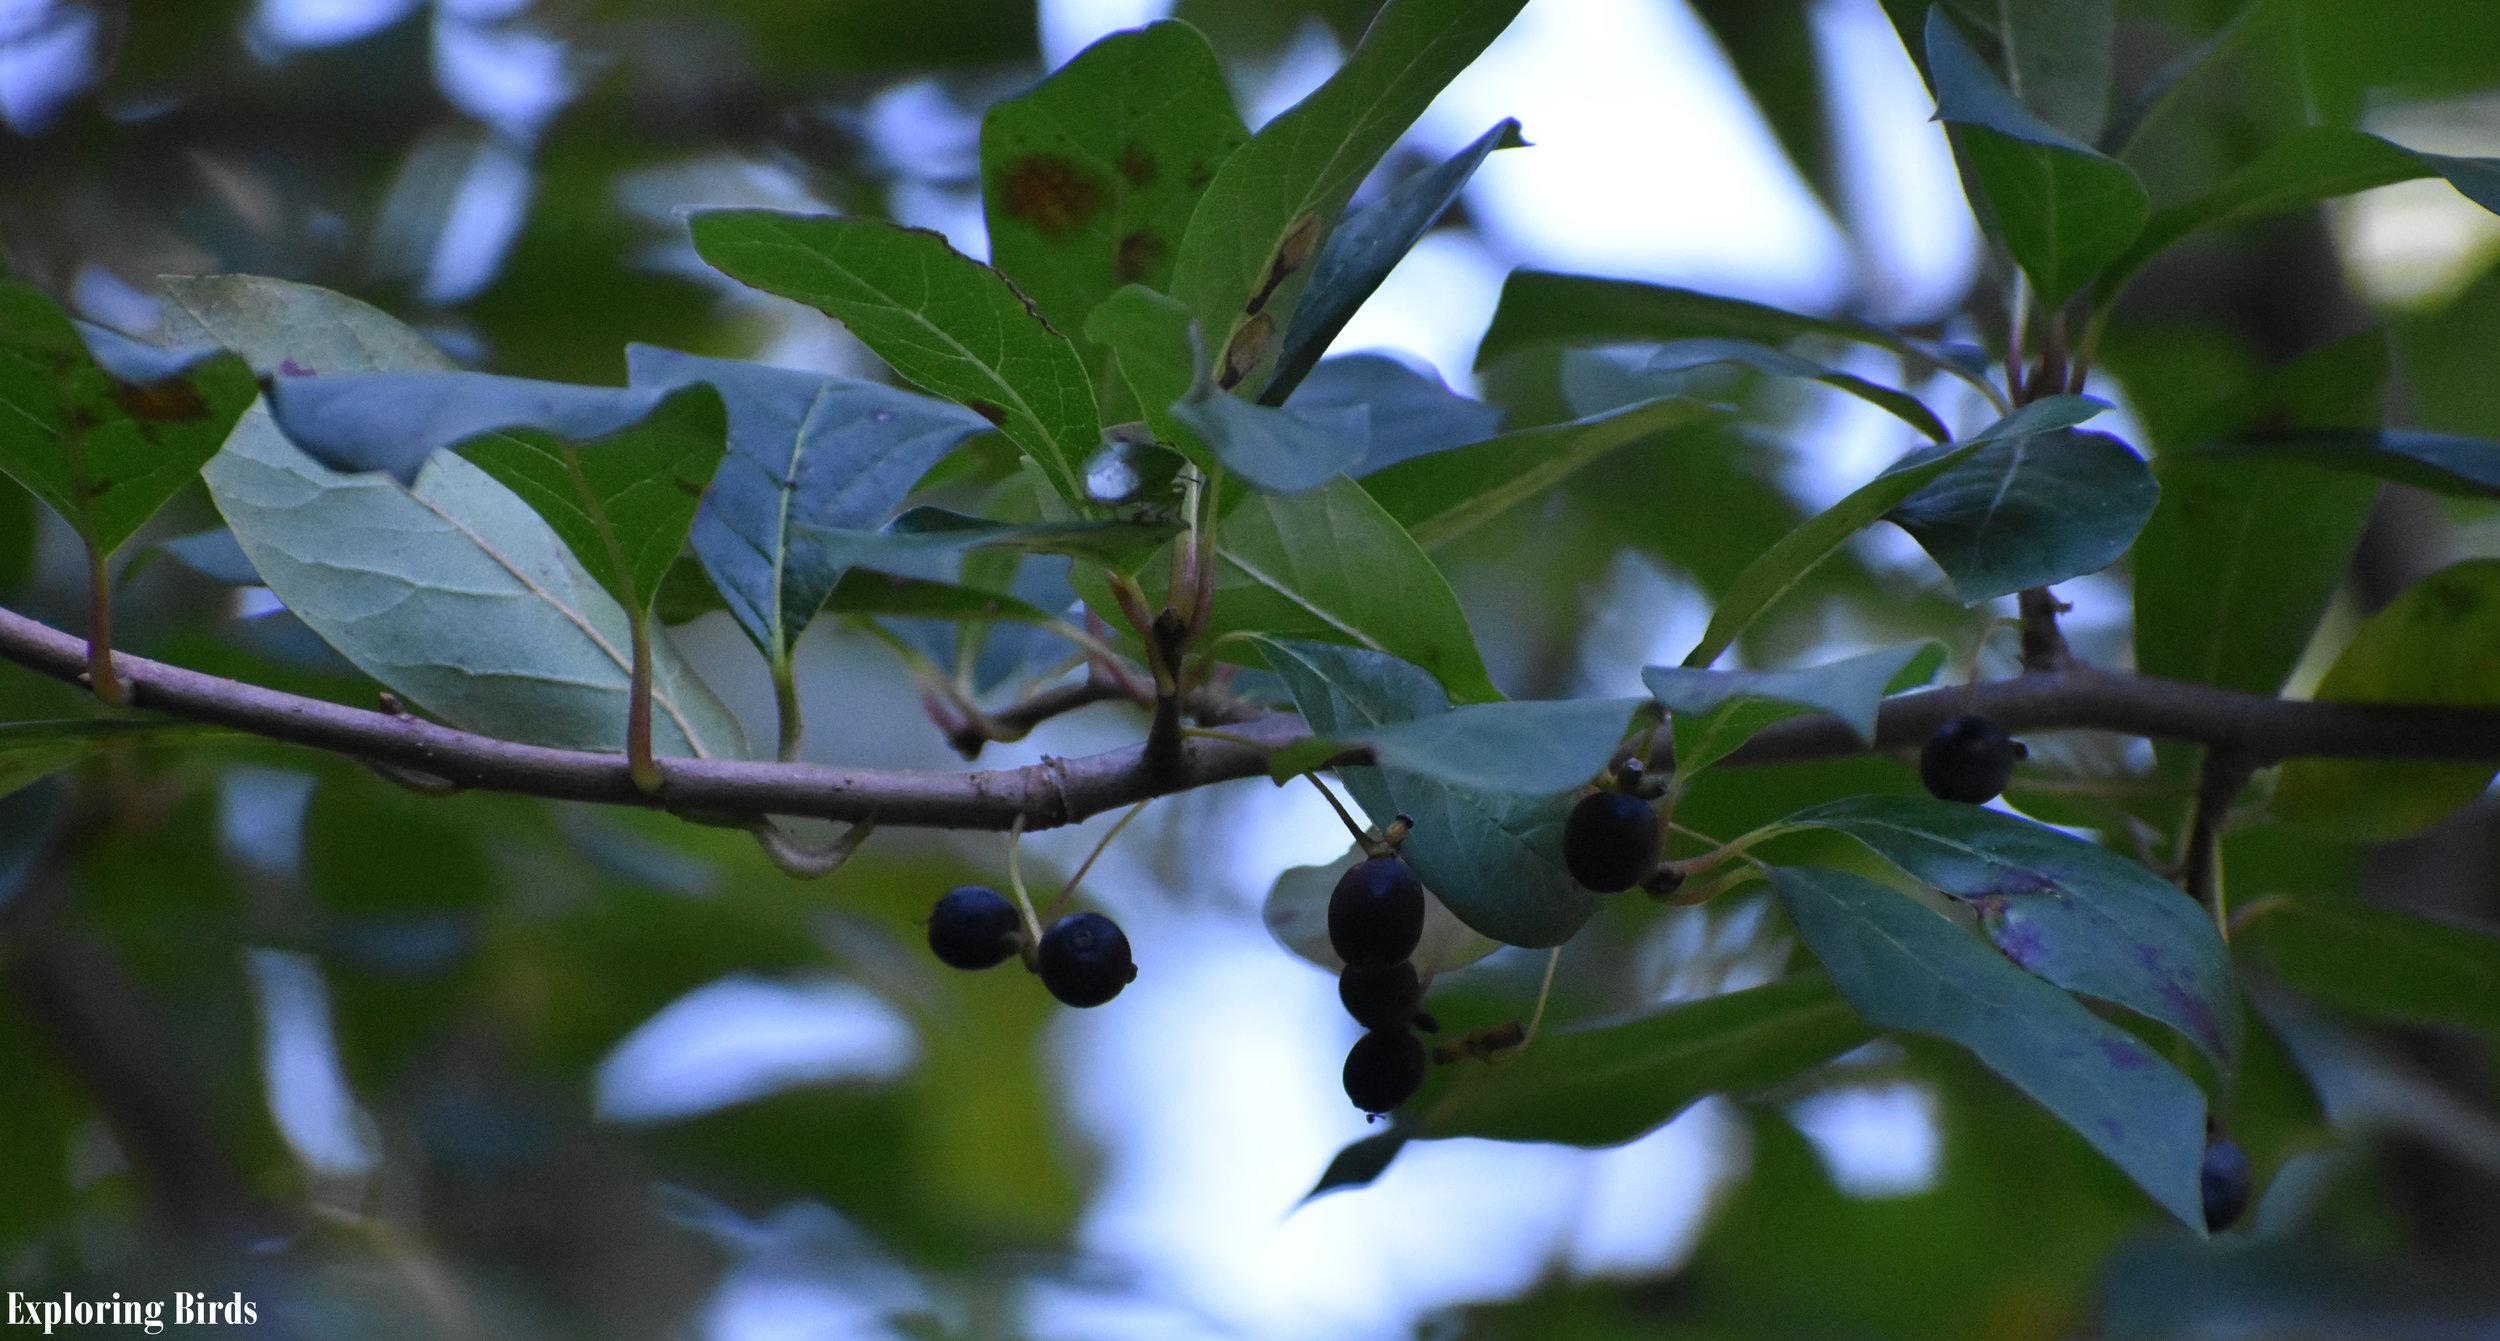 Blackgum trees attract birds